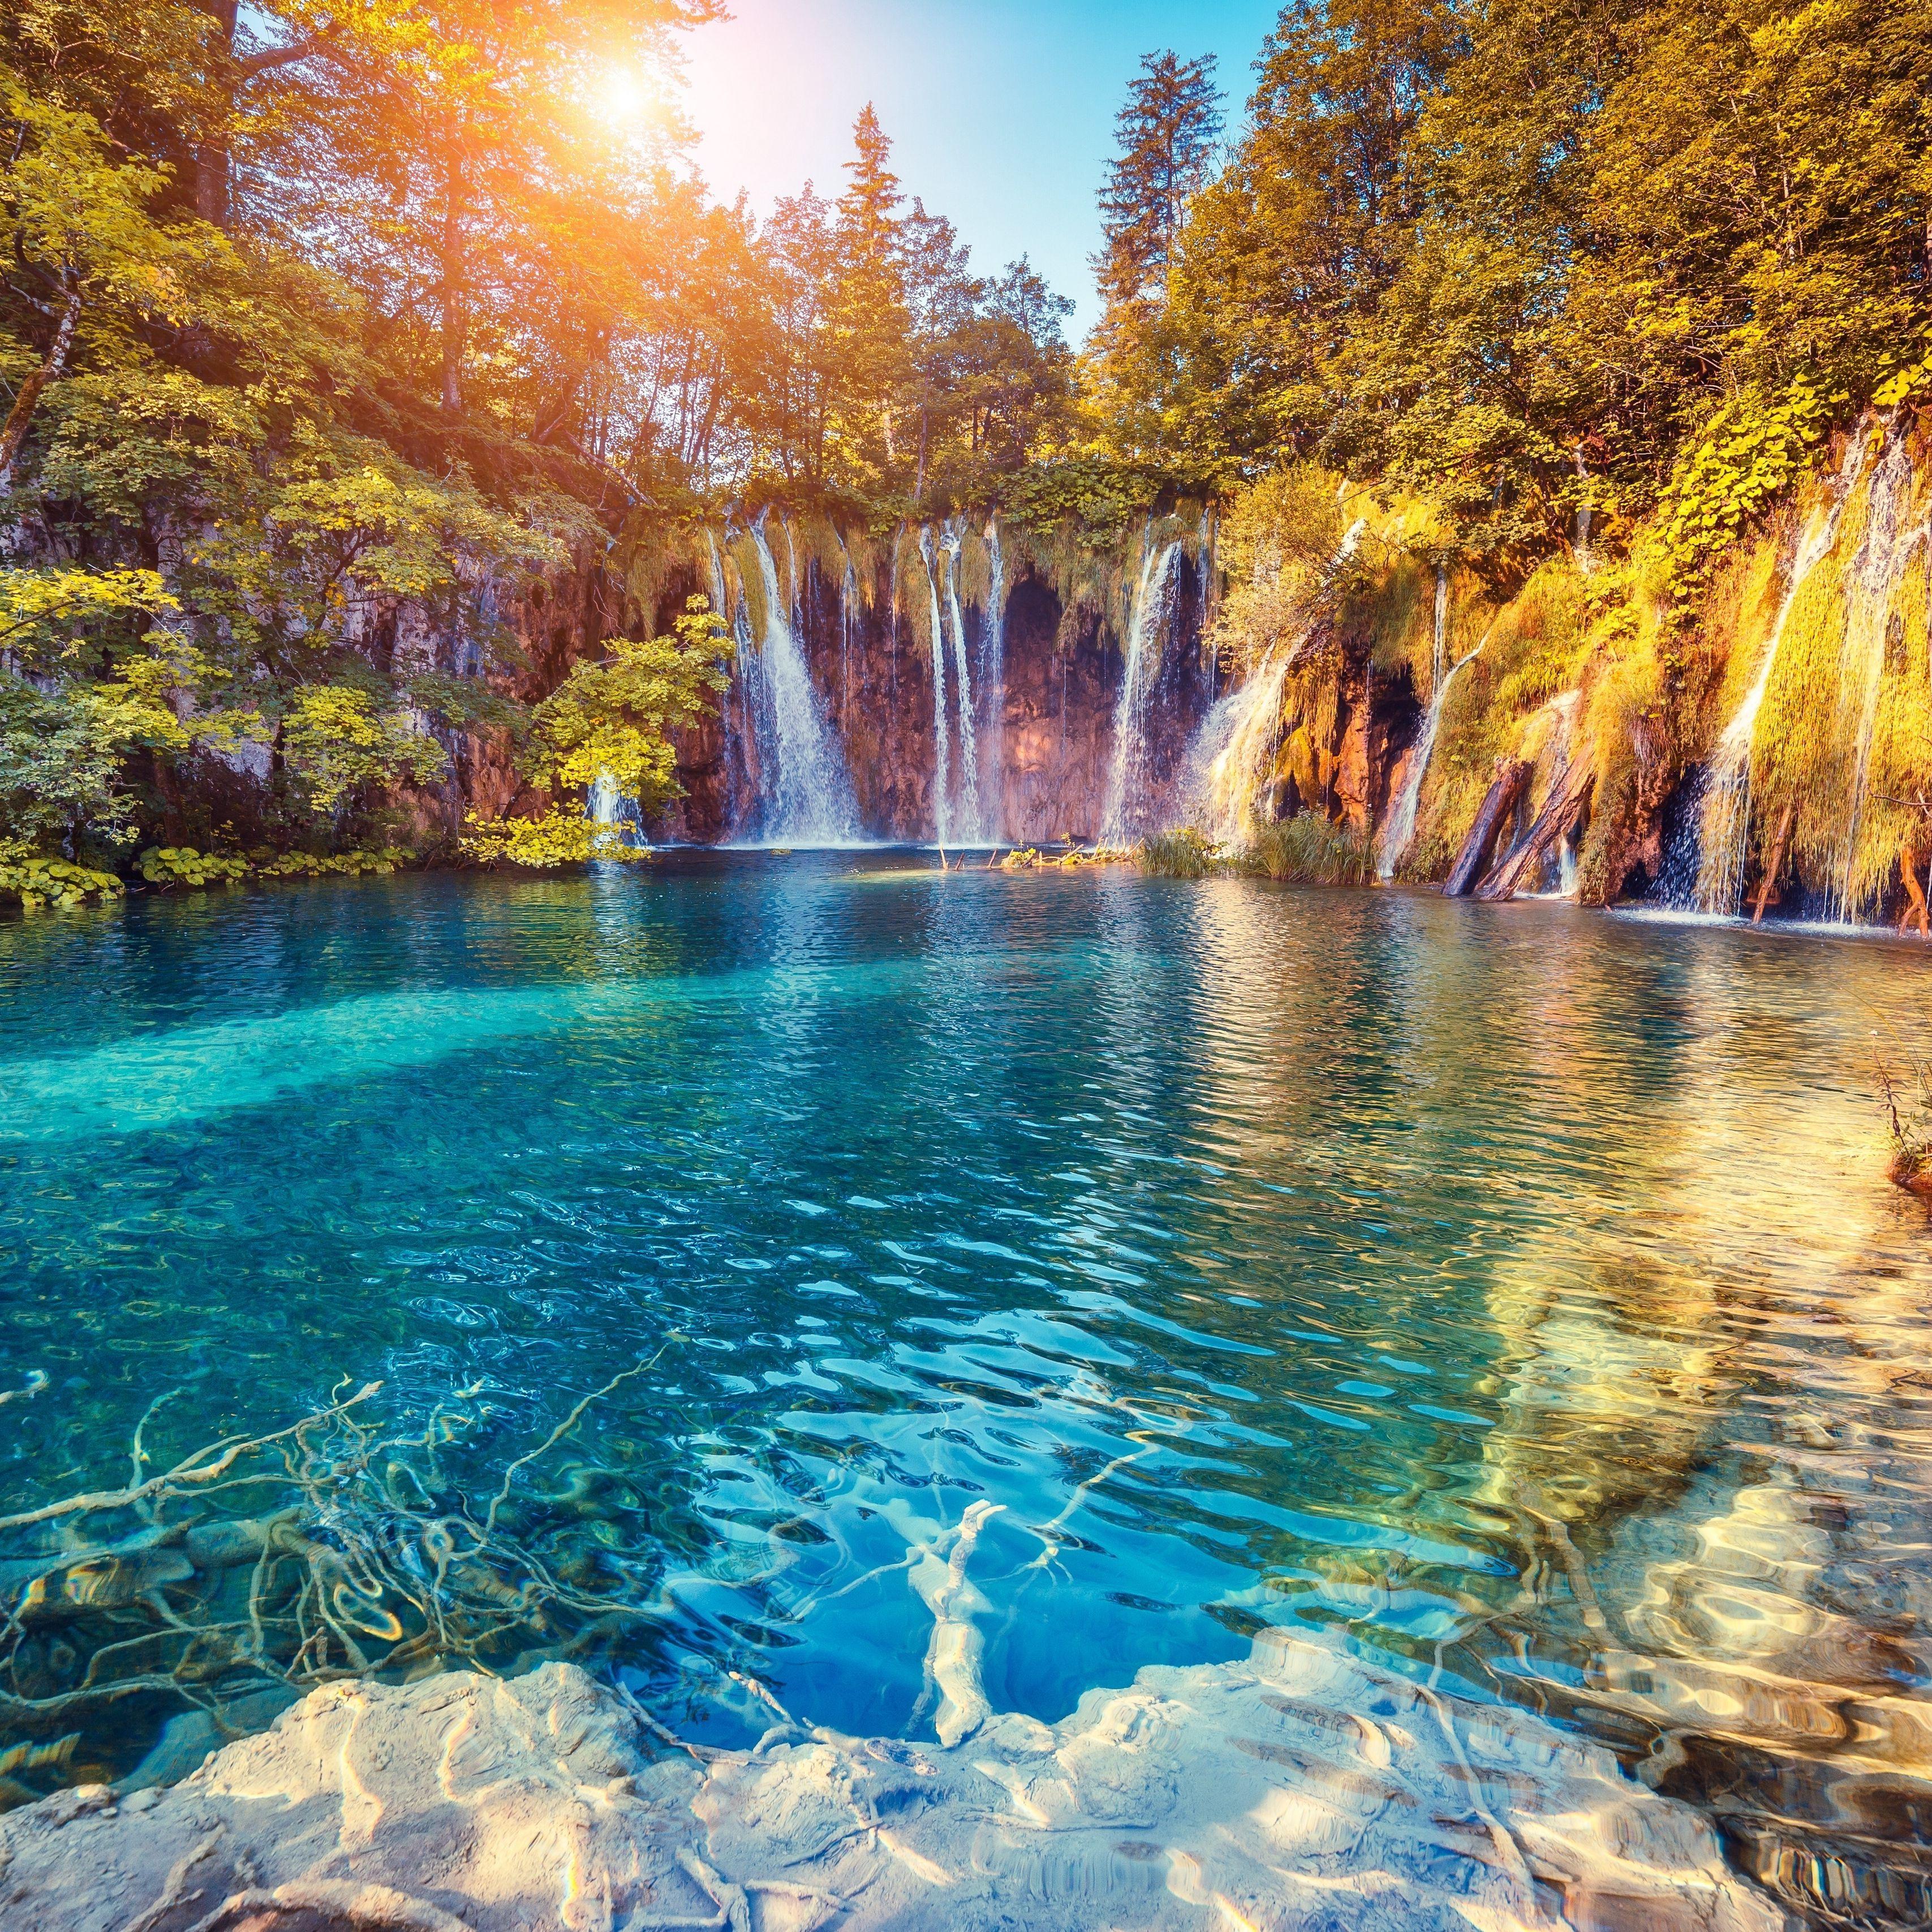 3415x3415 Wallpaper waterfall, precipice, sunlight, summer, bright, trees